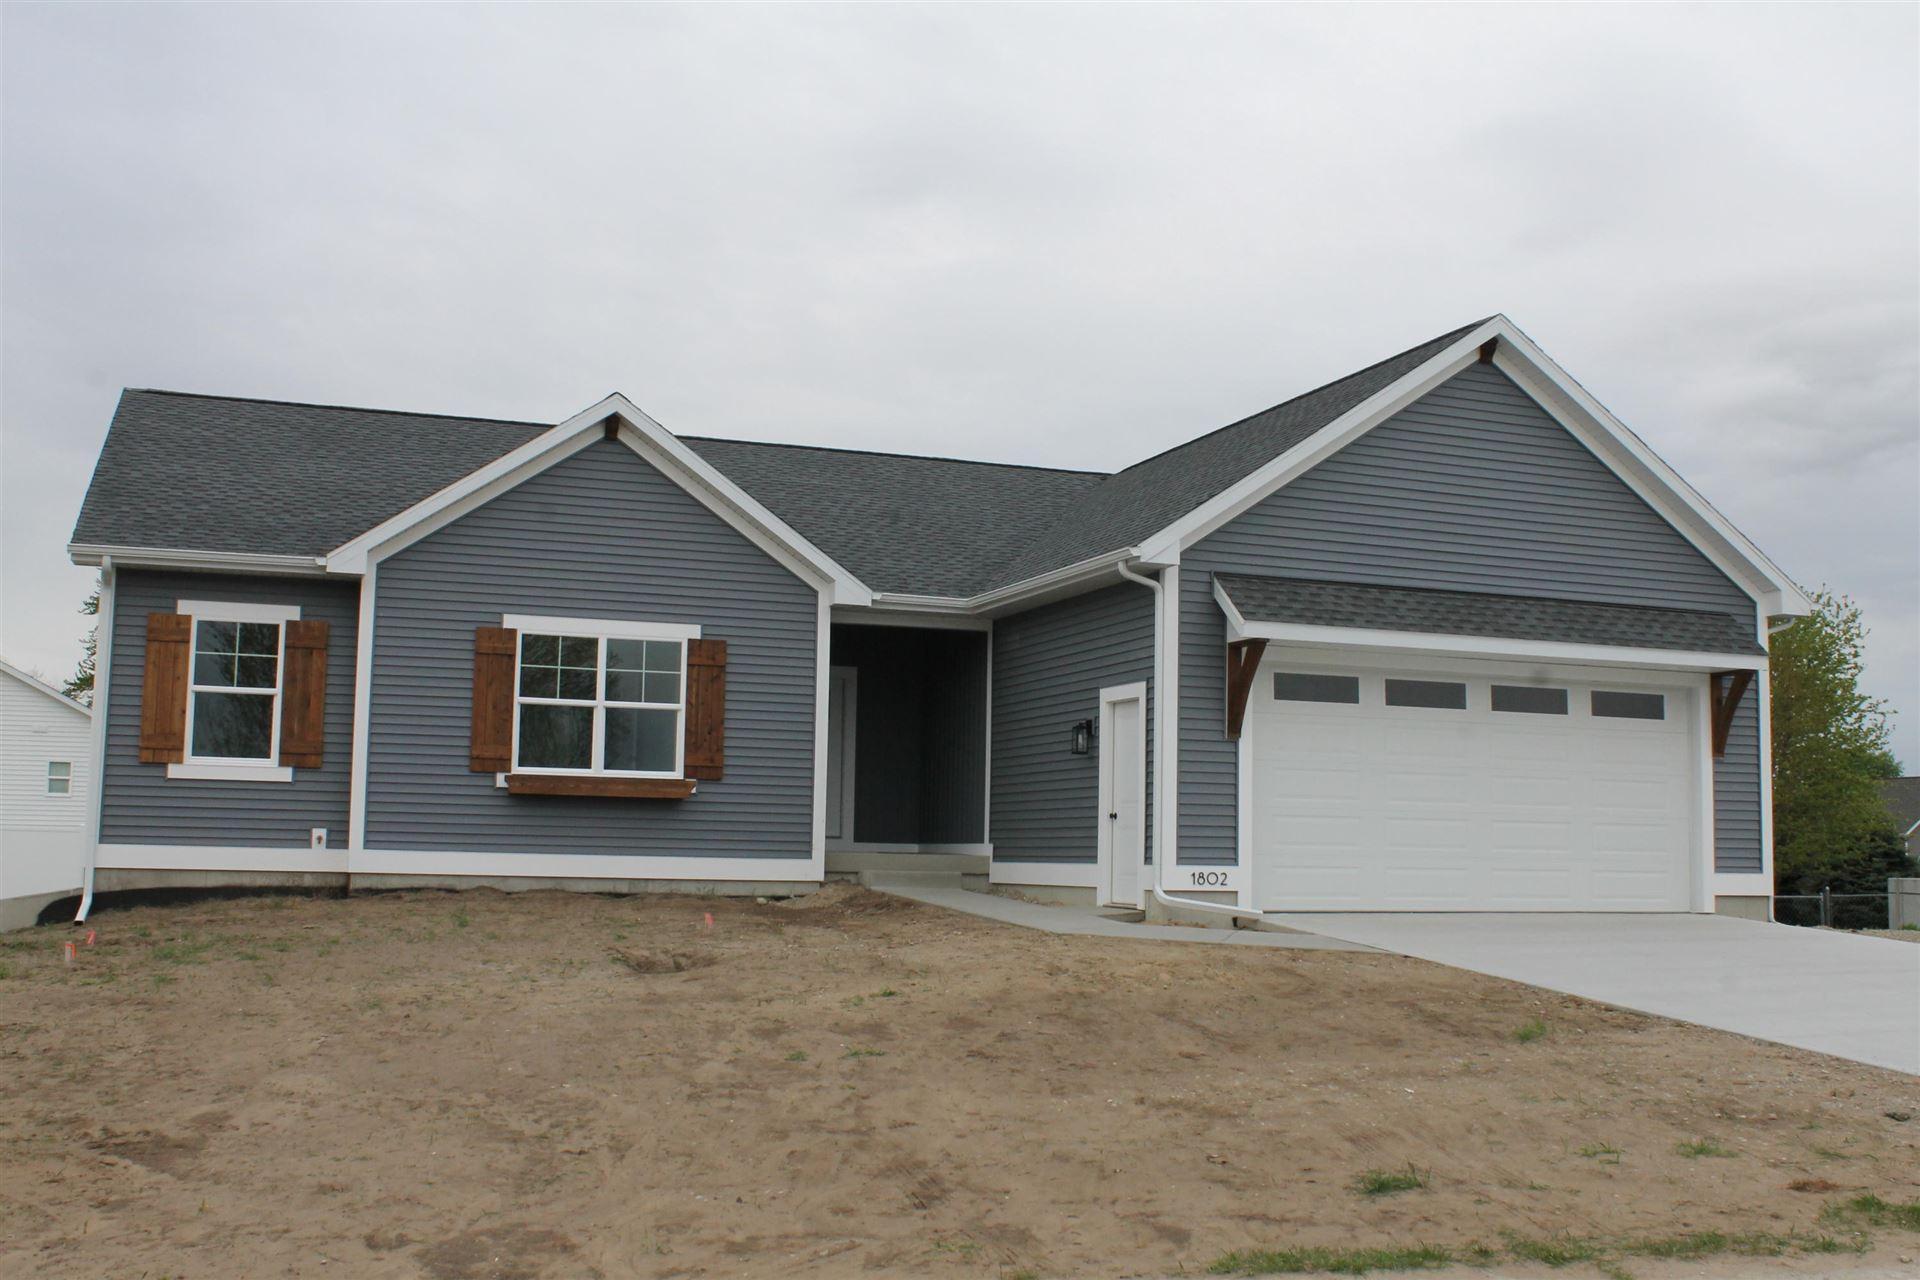 1802 Cooke Farm Drive, Dorr, MI 49323 - MLS#: 21015832